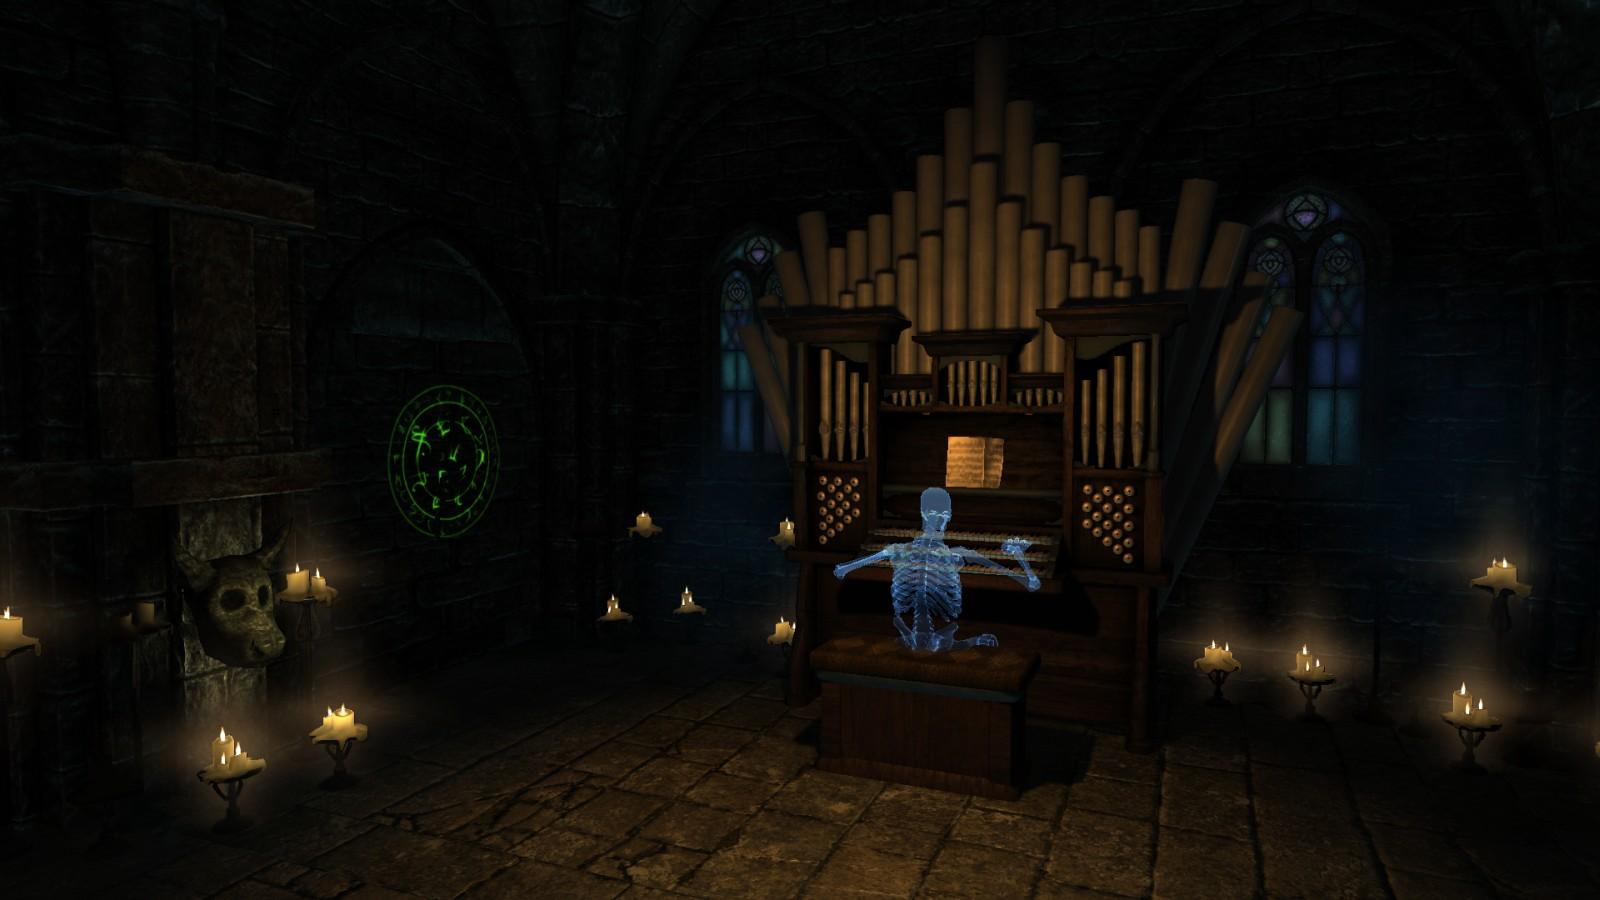 medievil___phantom_of_the_opera_by_korin